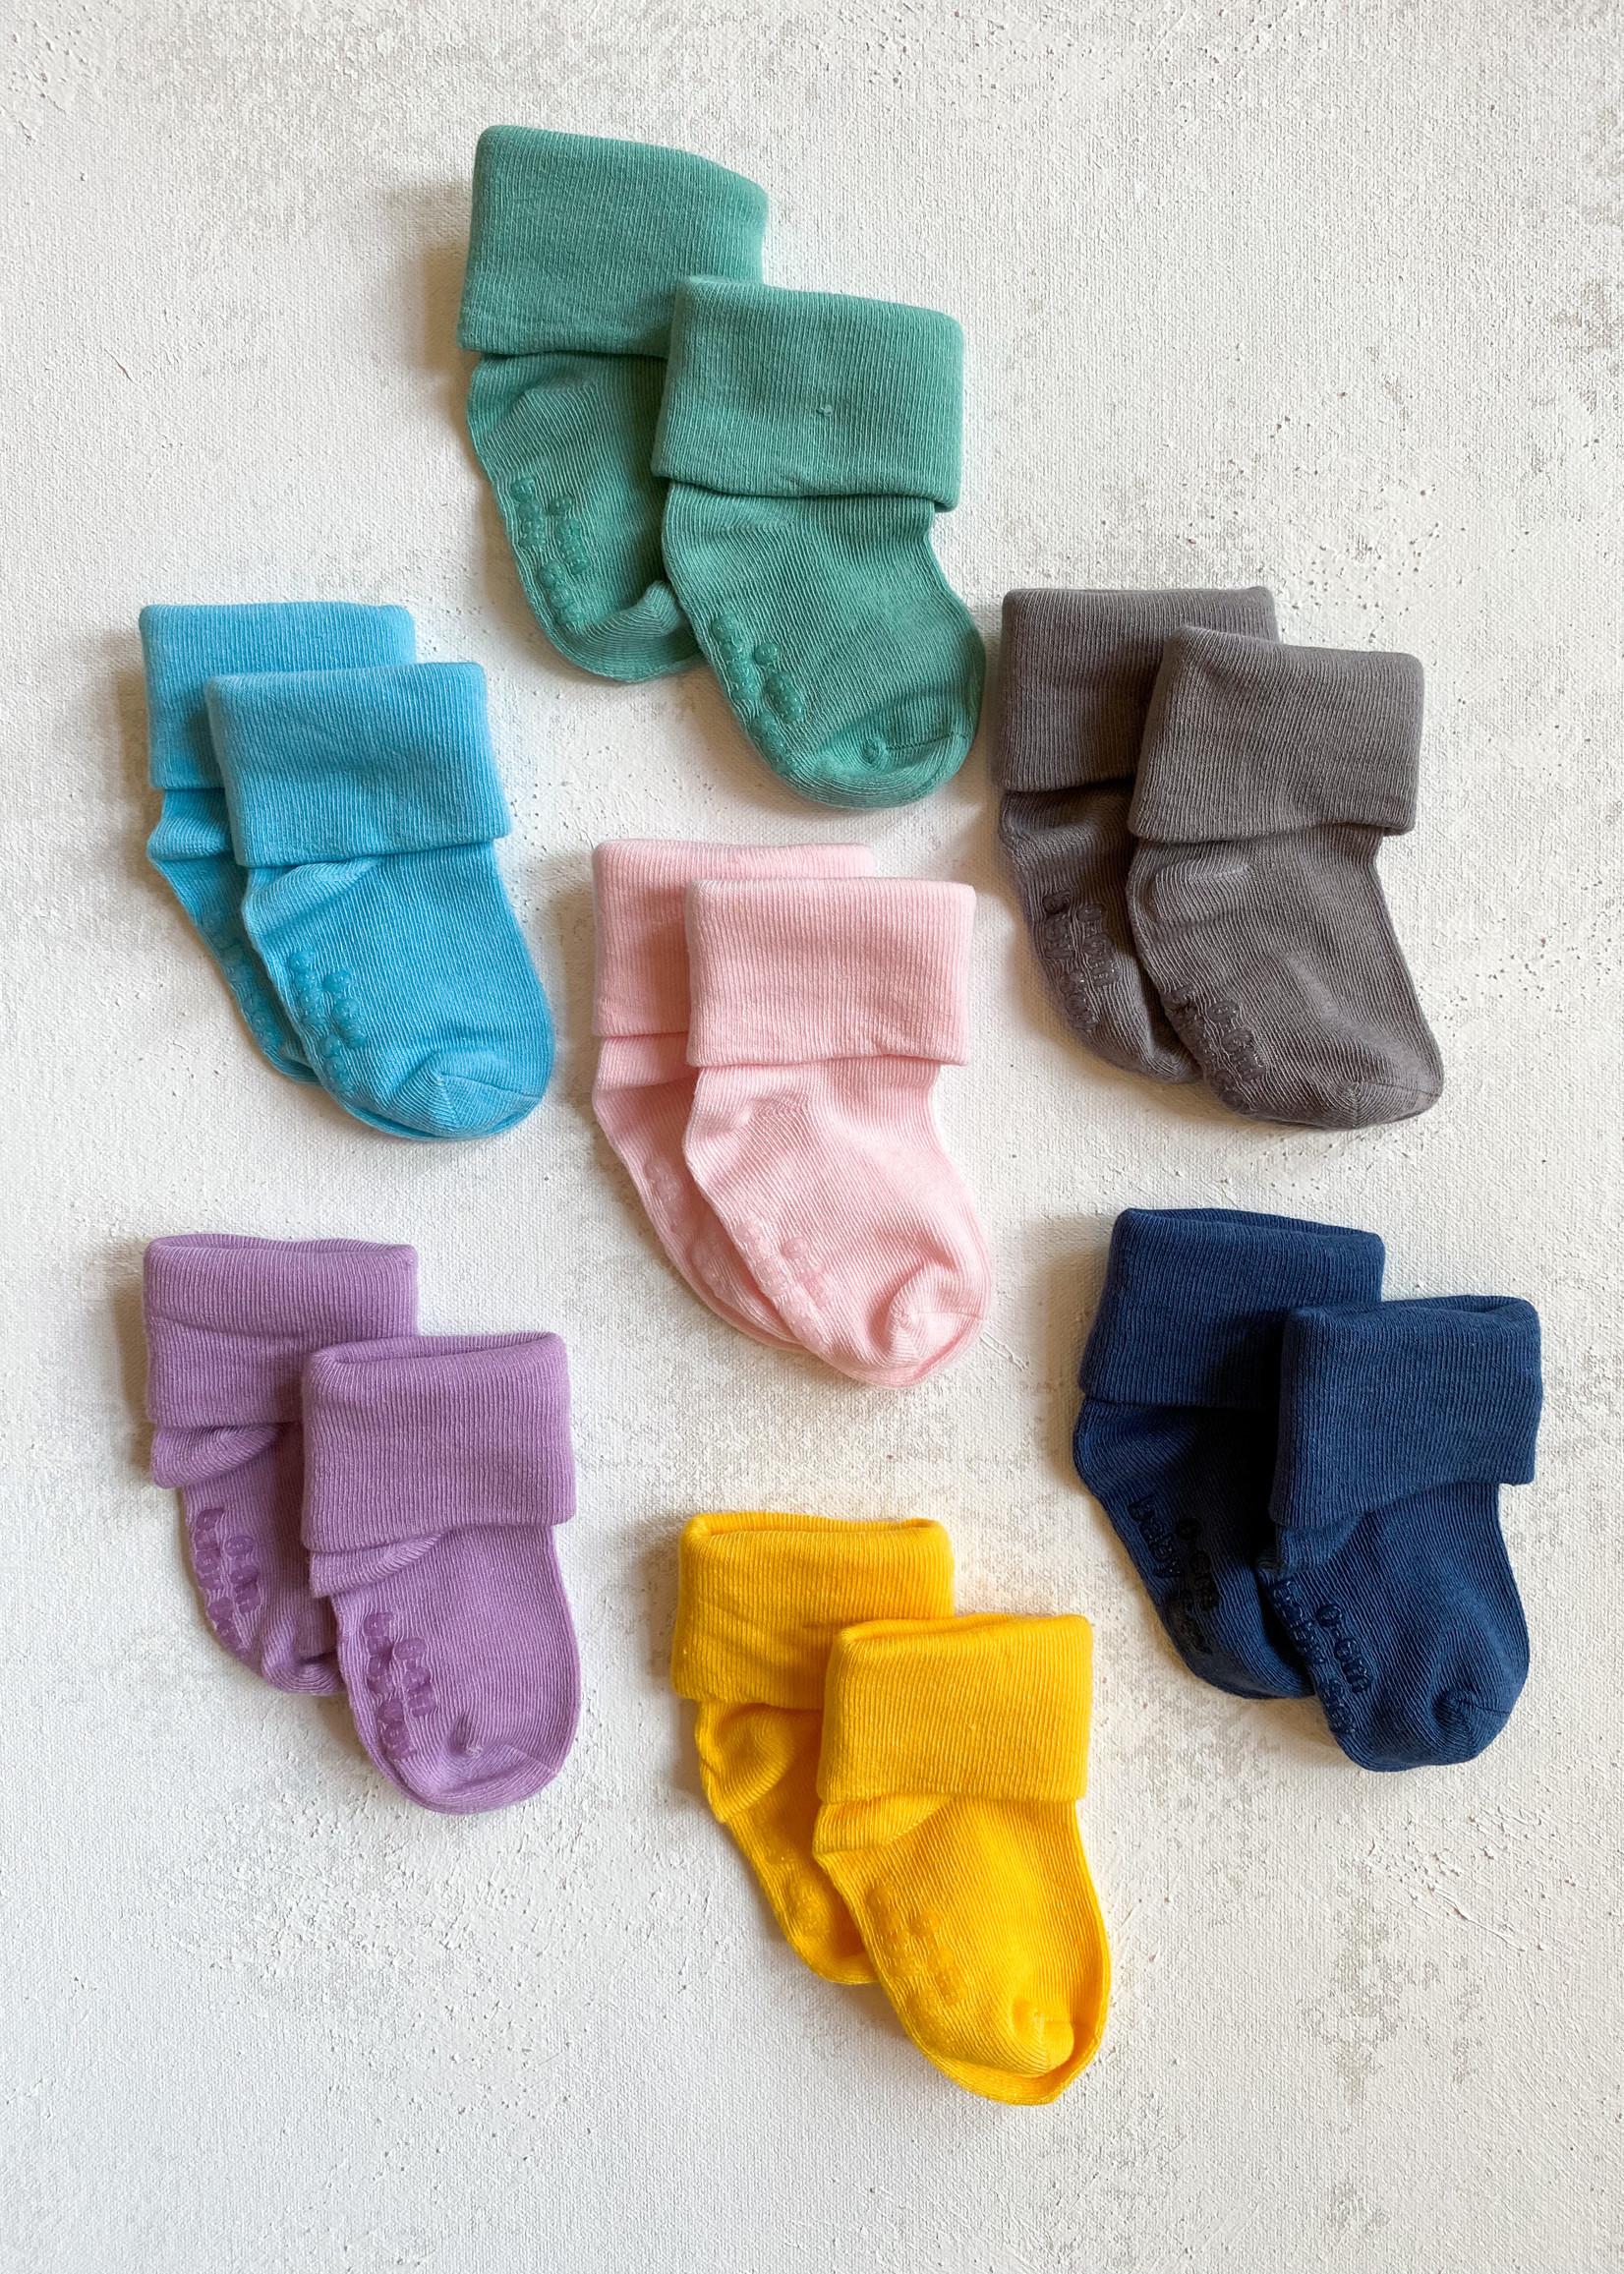 Elitaire Petite Modern Socks in Dragonfly